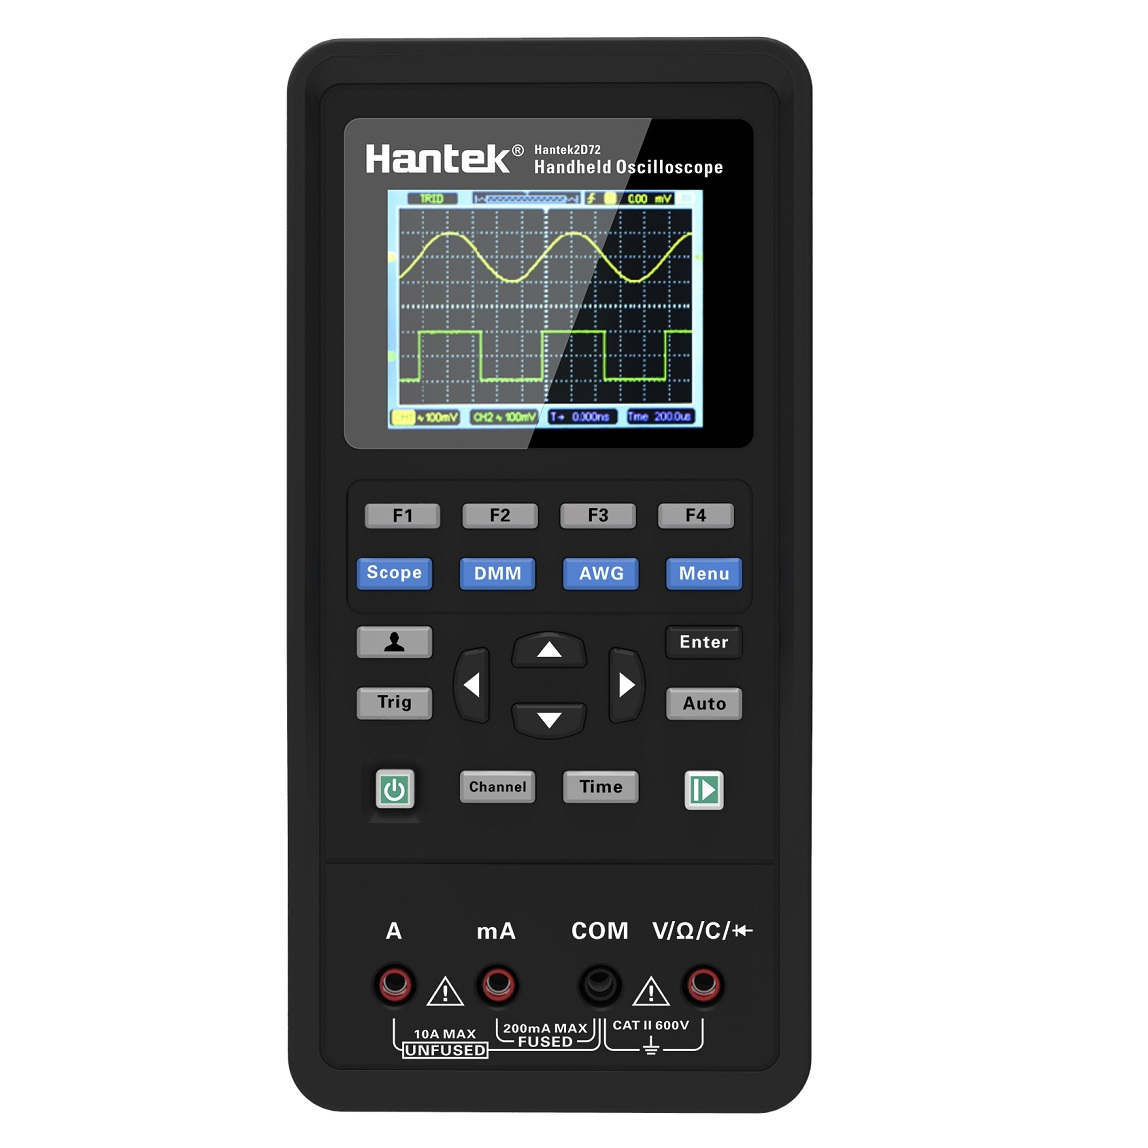 Hantek 3in1 Digital Oscilloscope Waveform Generator Multimeter Portable USB 2 Channels 40mhz 70mhz LCD Display Test